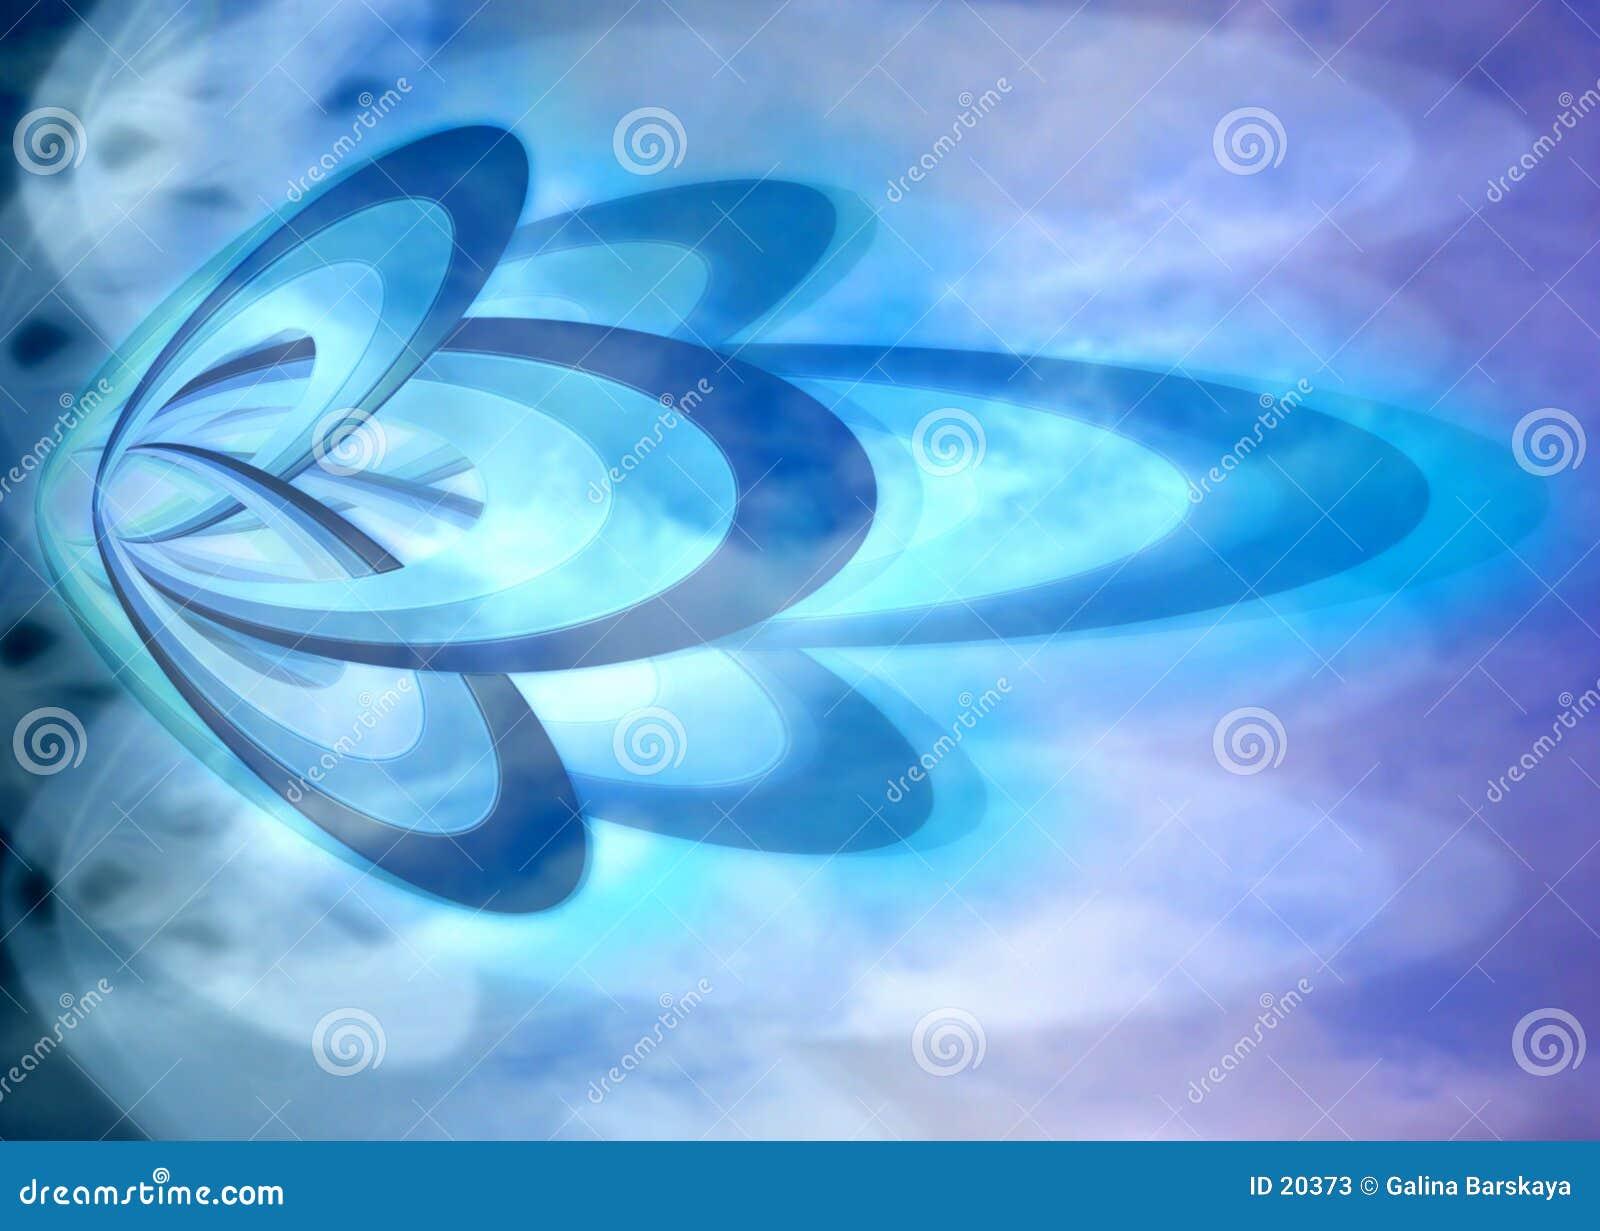 Niebieska tła abstrakcyjne